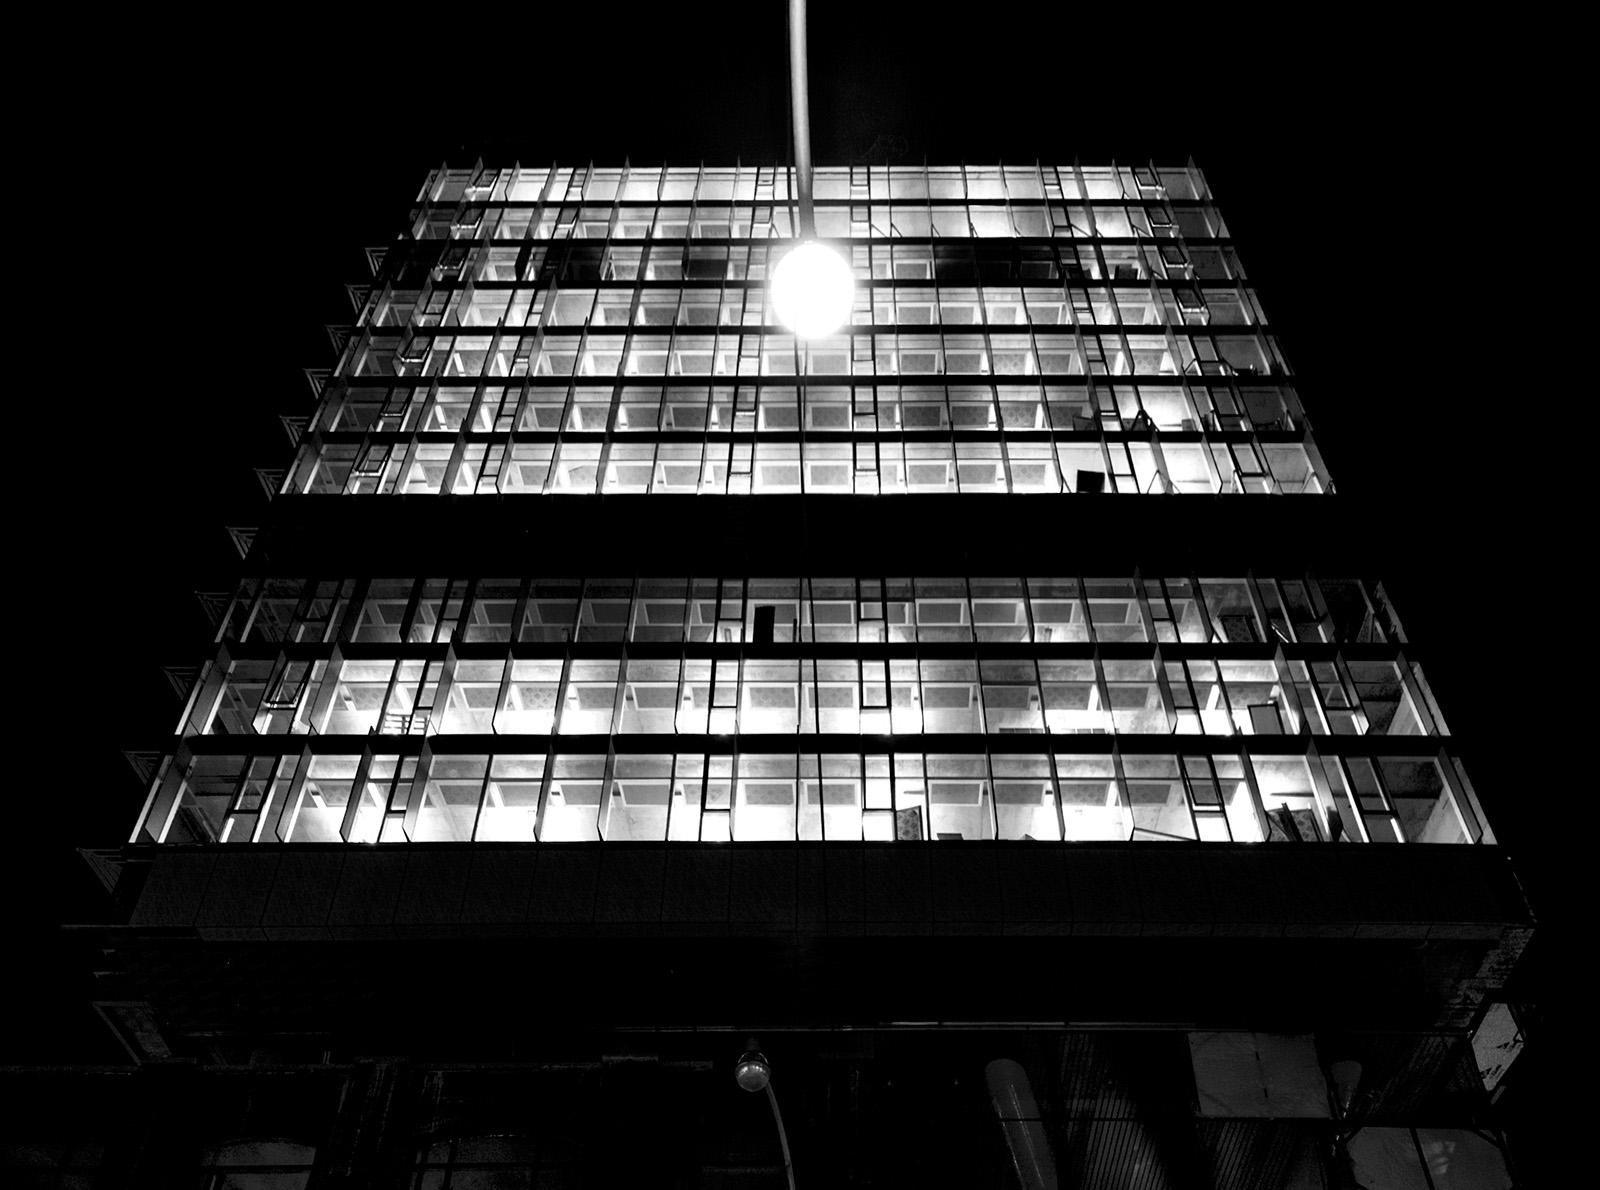 20150628. Street light versus glass box building at night. Shot